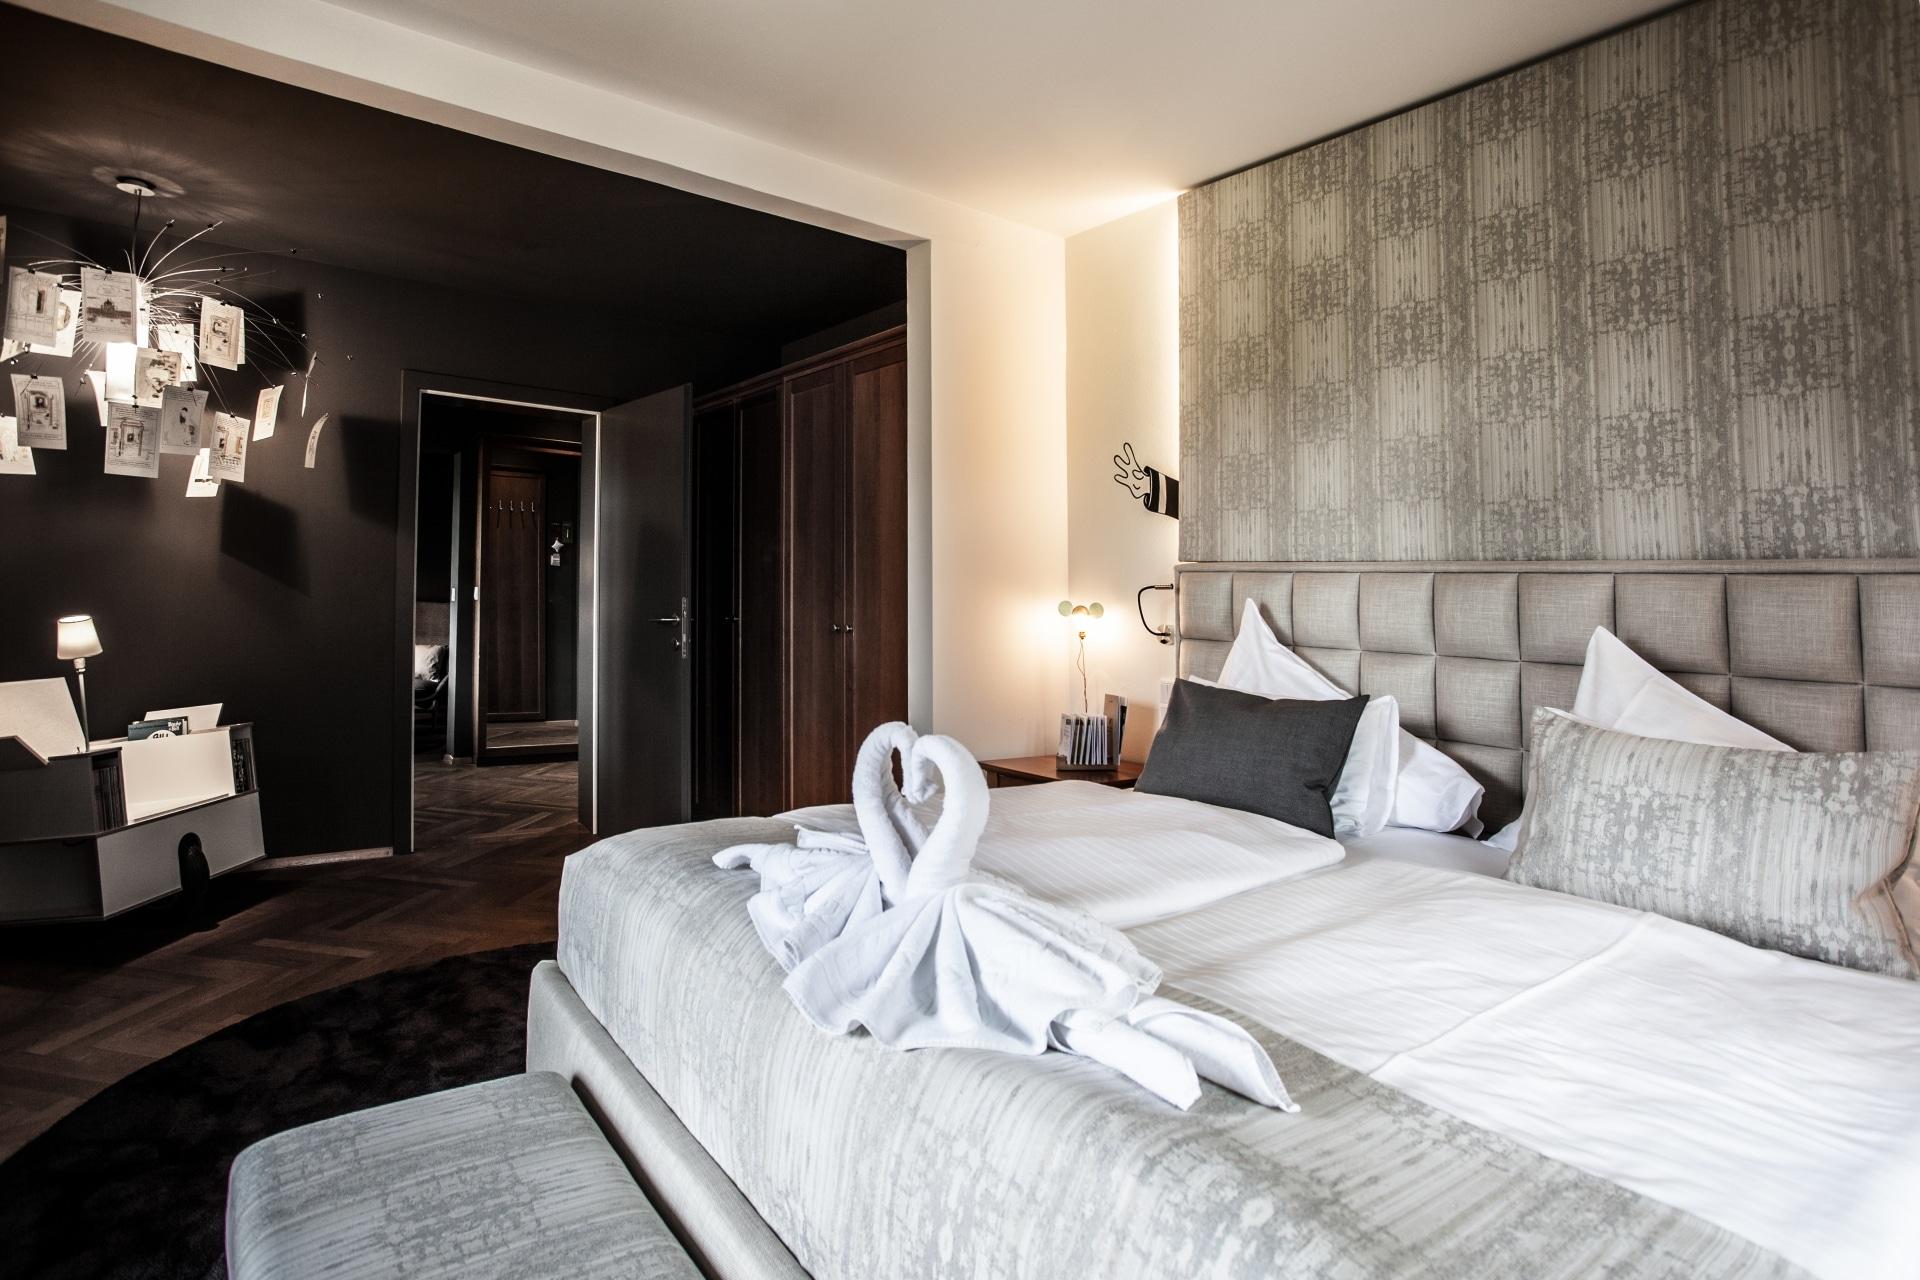 Seufzer Suite im Hotel die Wasnerin